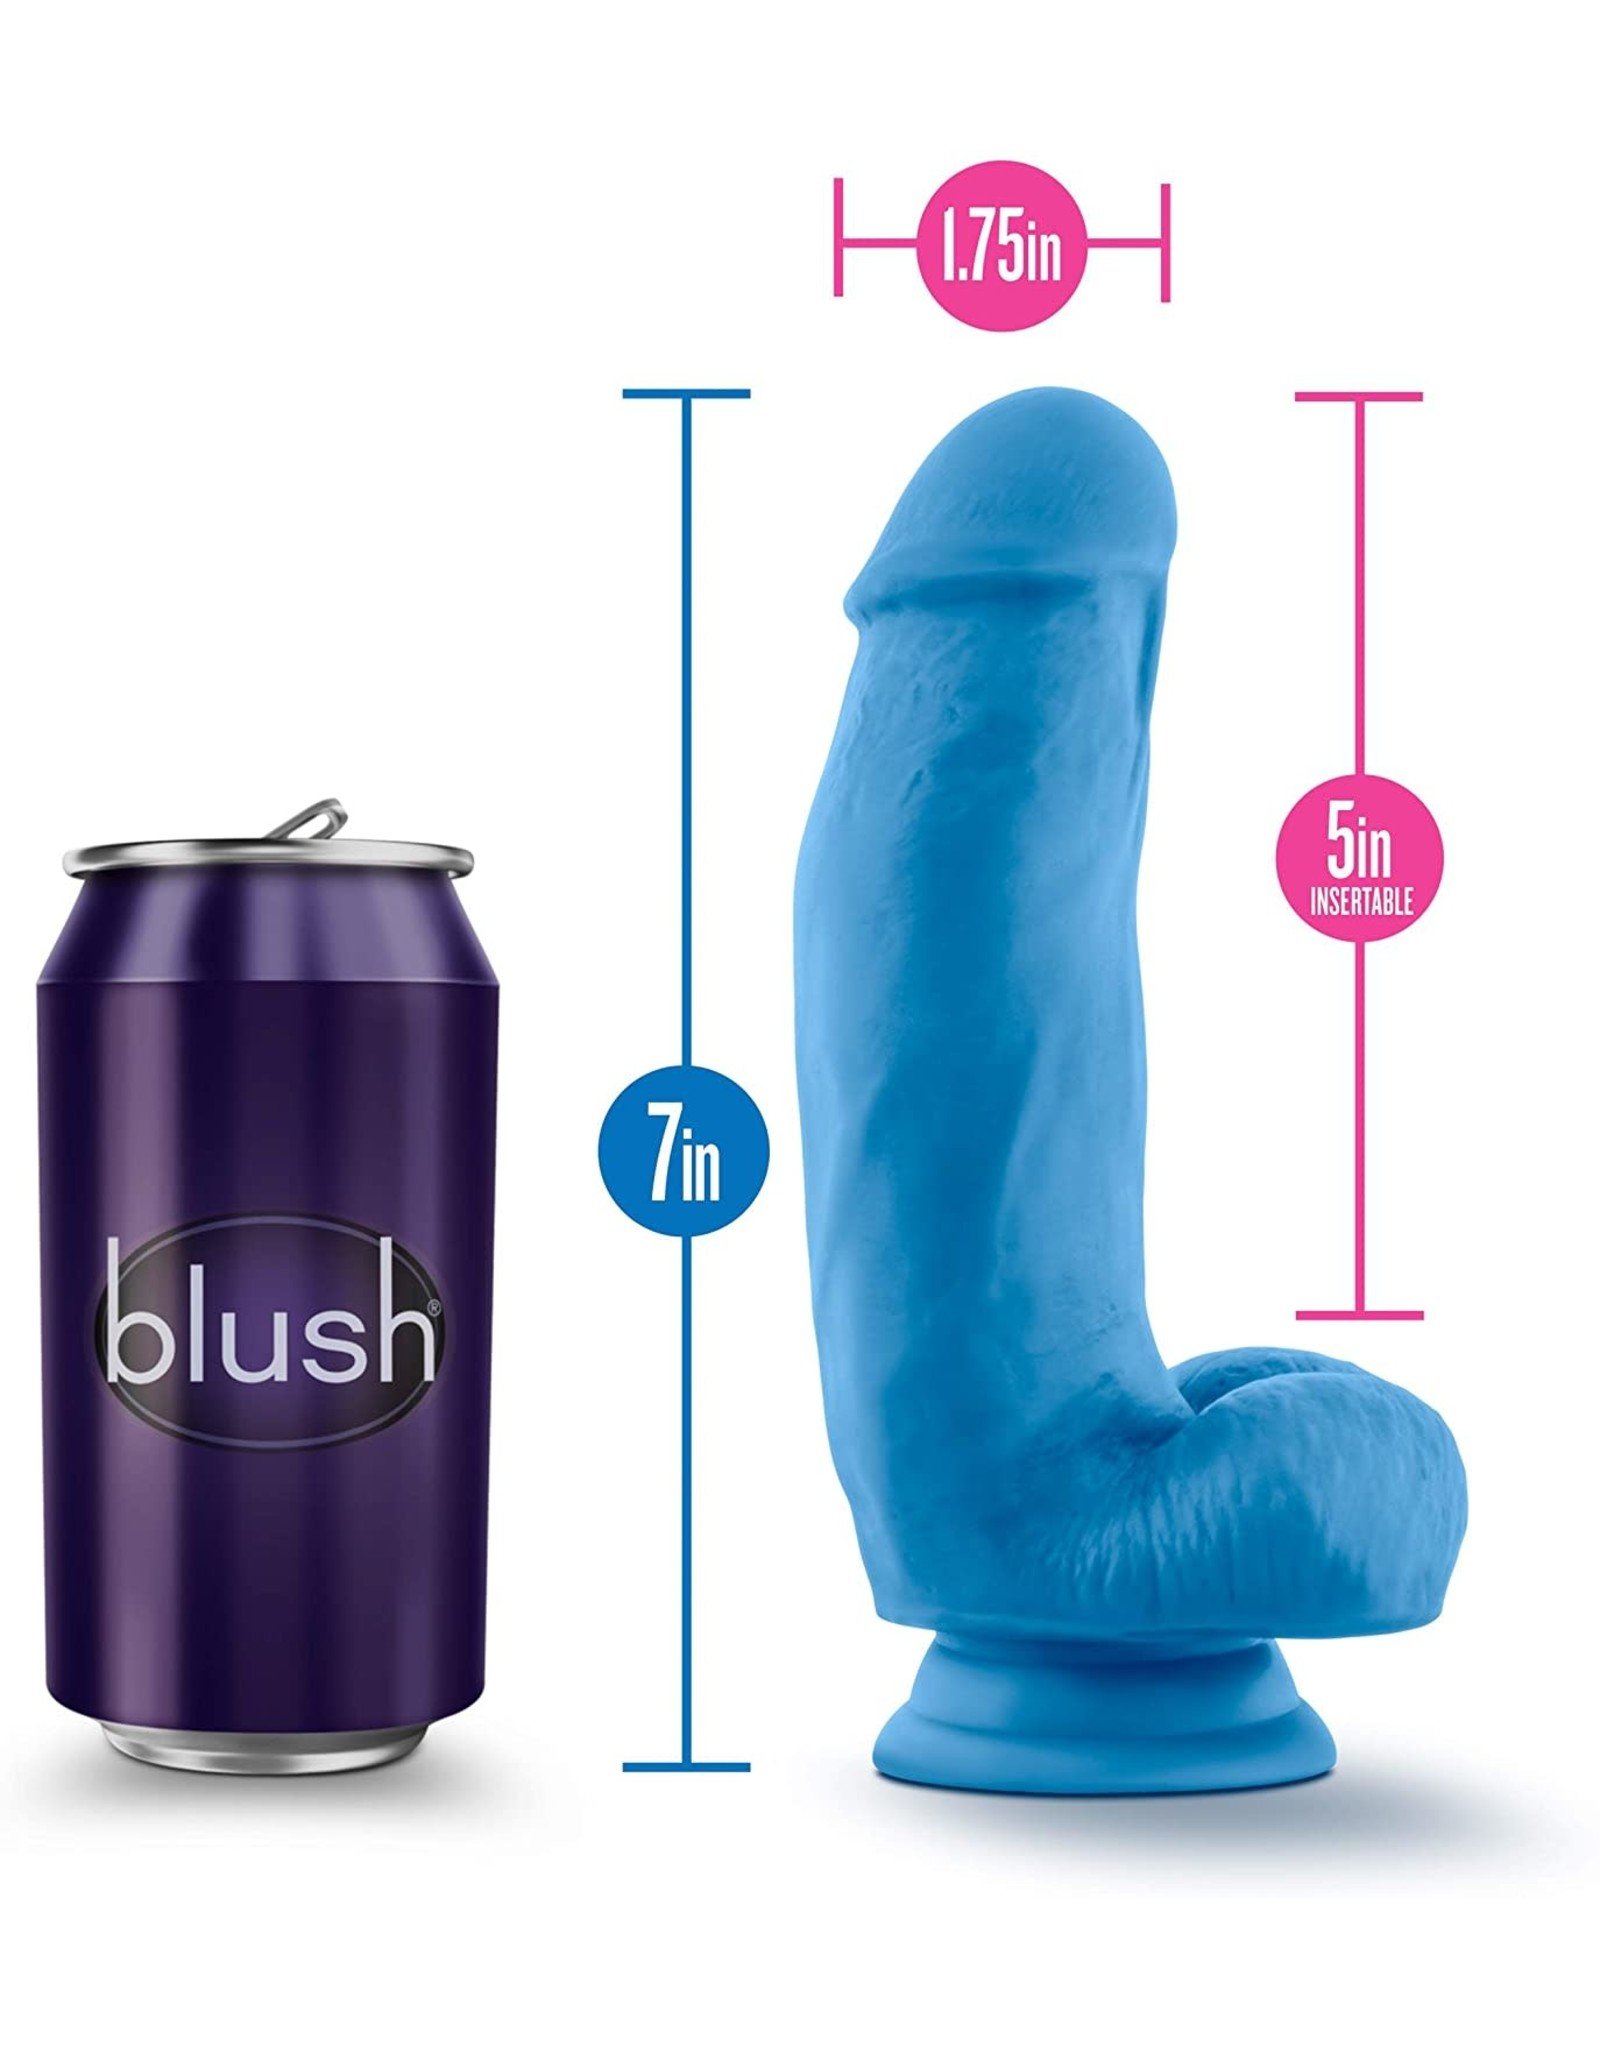 BLUSH BLUSH - NEO ELITE - 7' SILICONE DUAL DENSITY COCK W BALLS - NEON BLUE